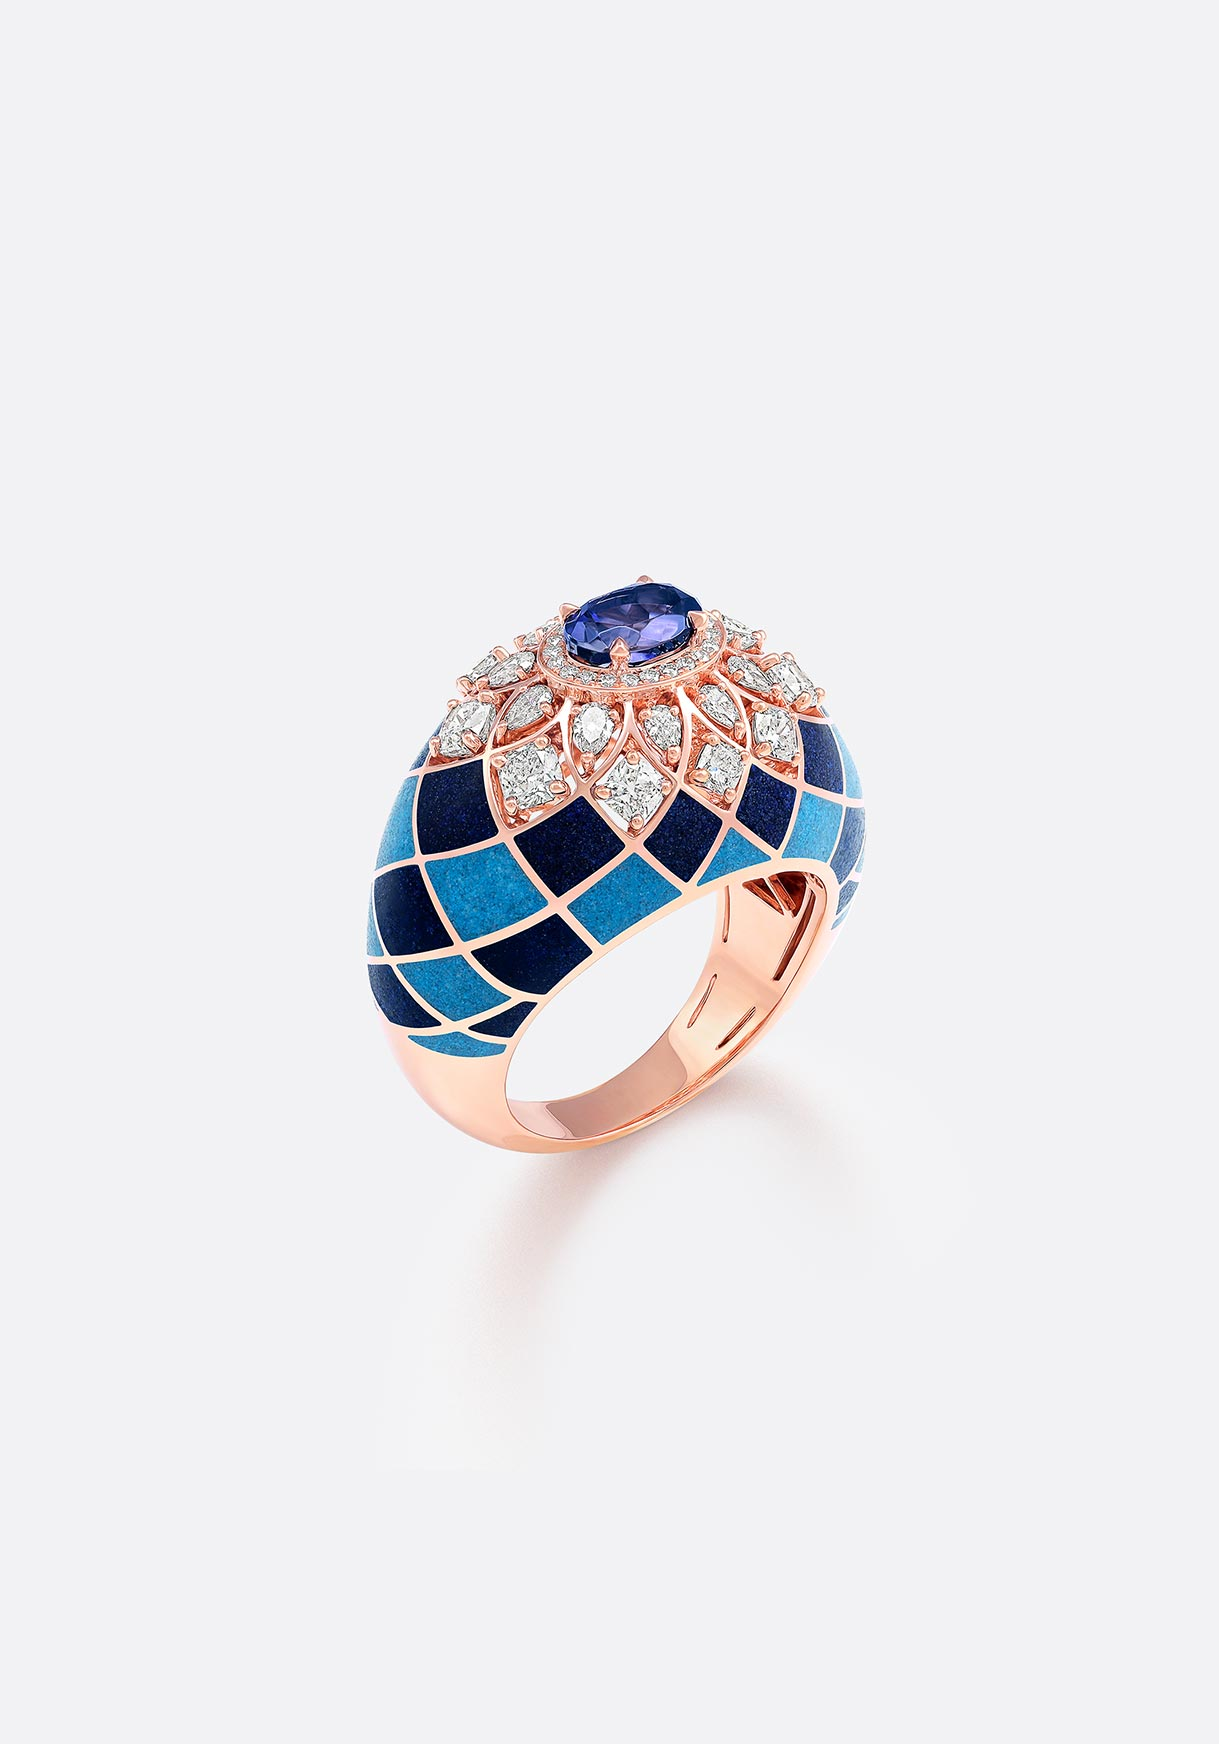 Ring - Fancy-cut diamonds patterned in rose gold.